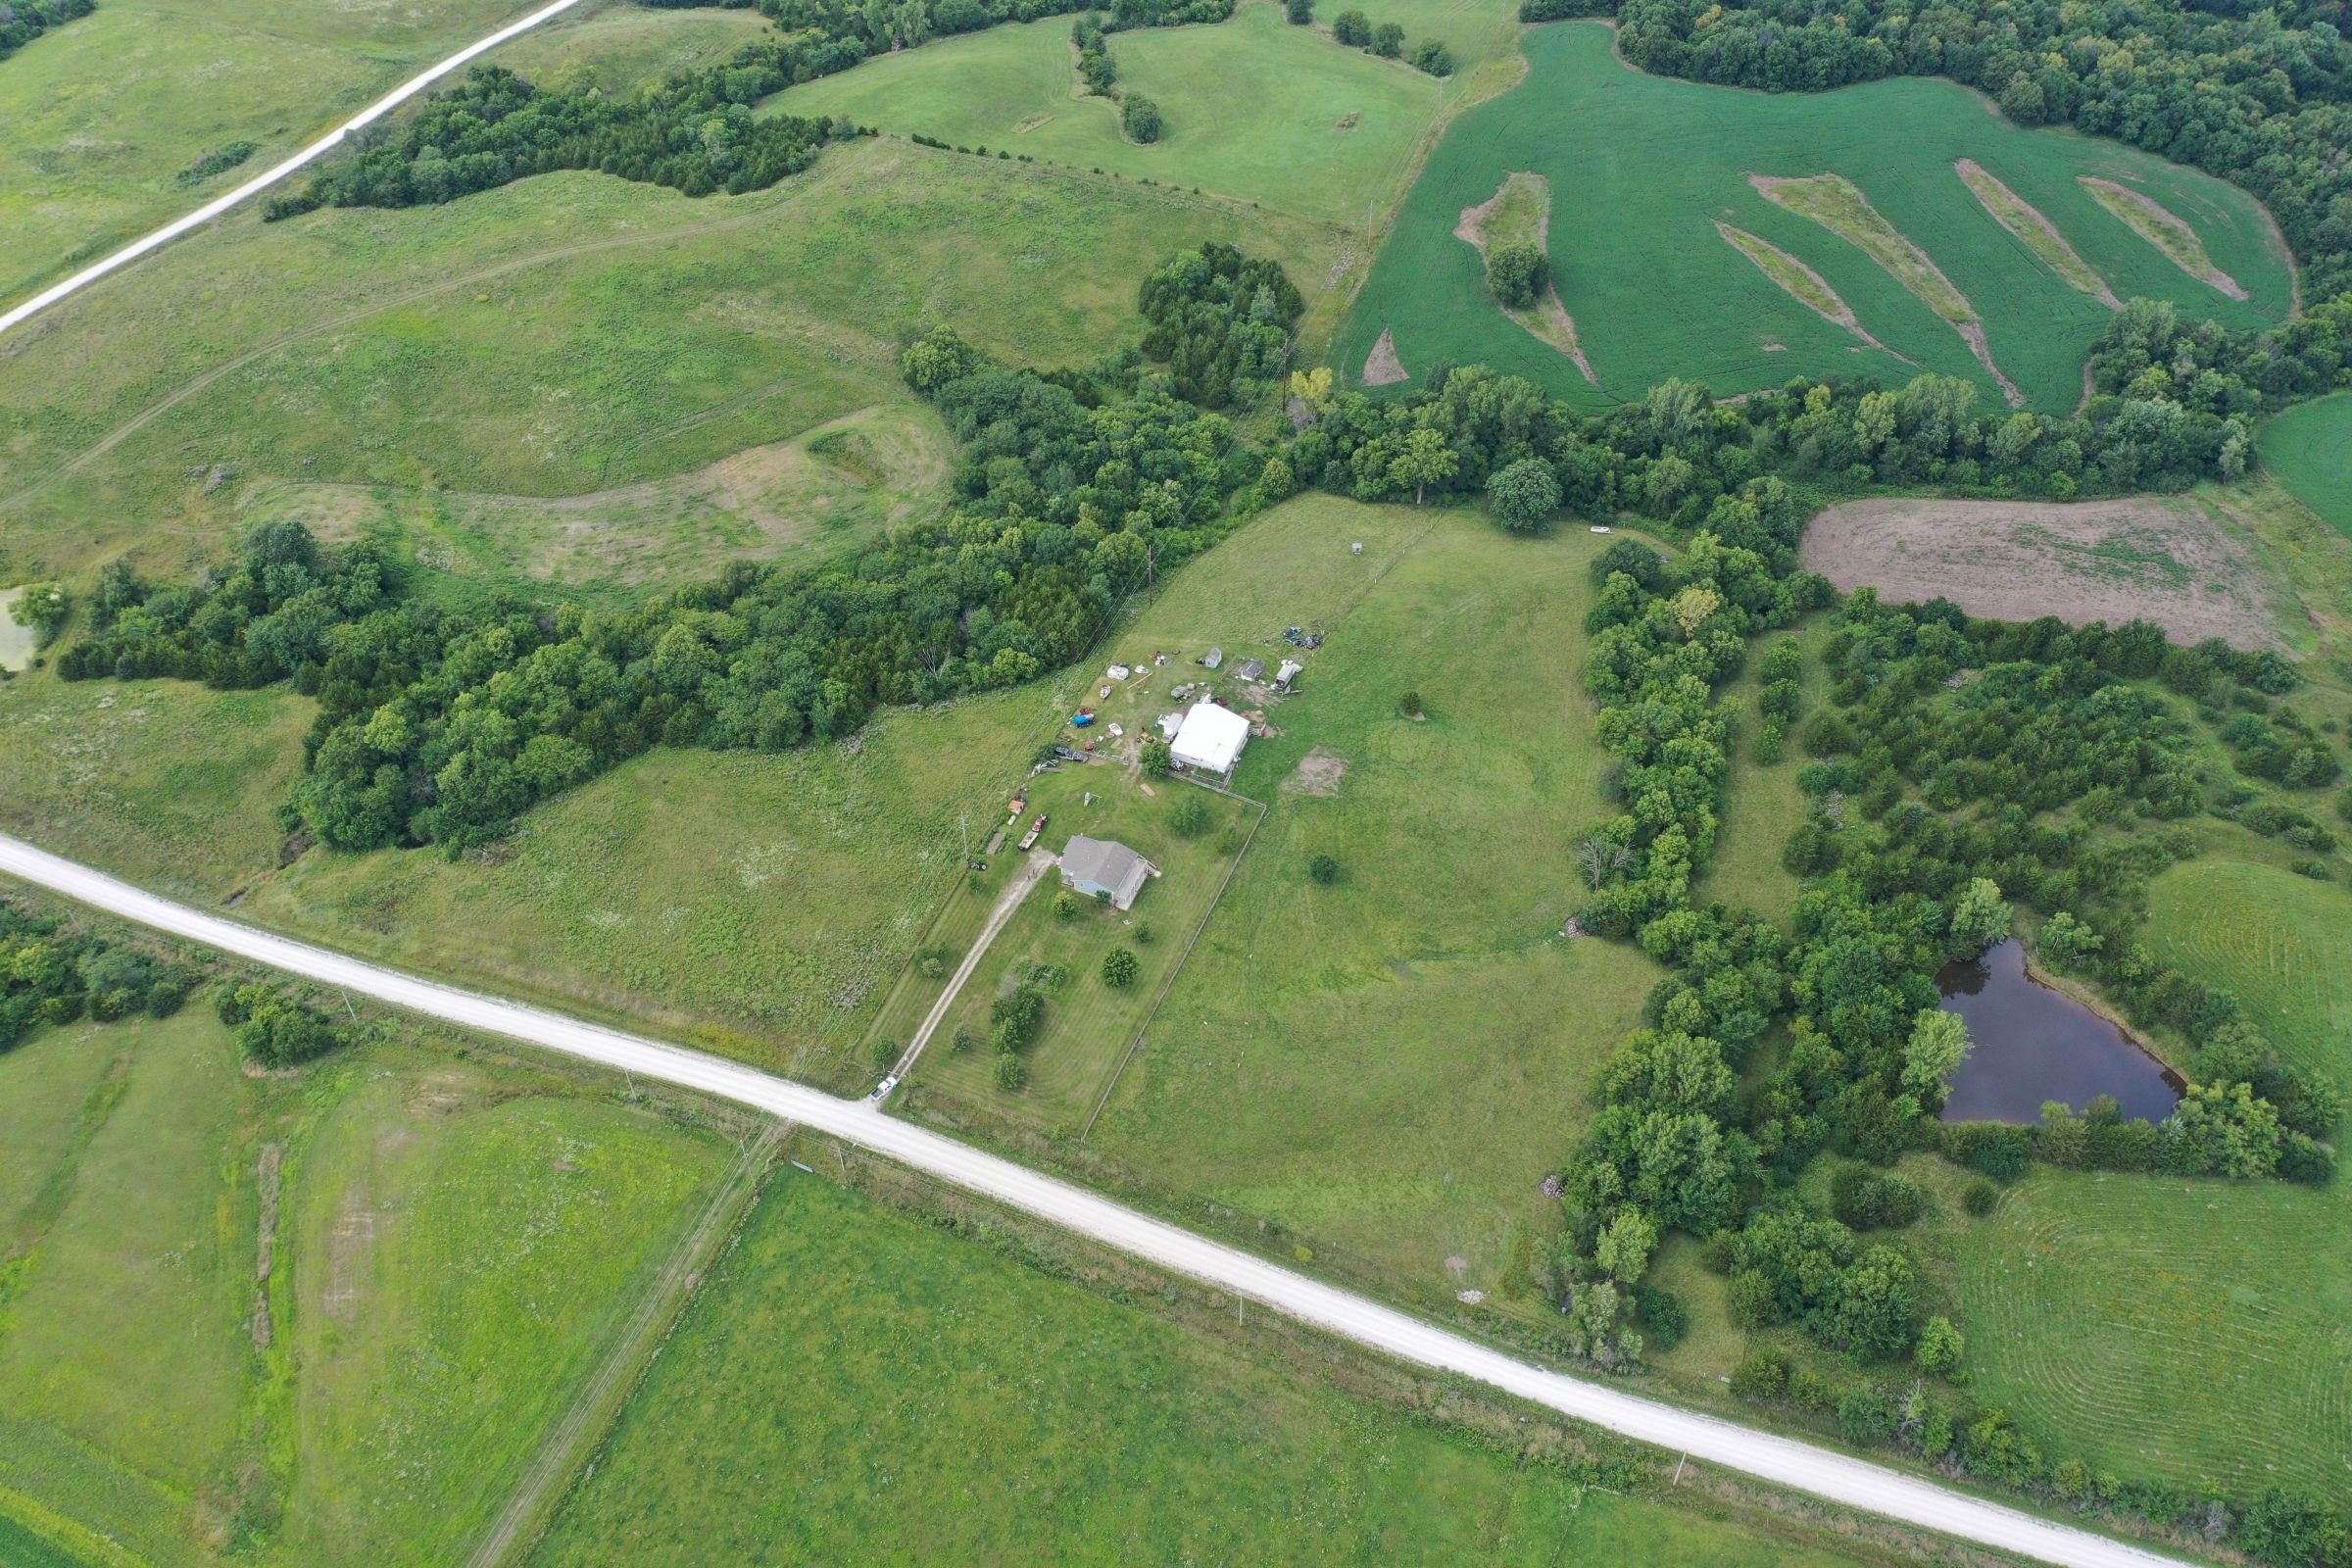 residential-warren-county-iowa-12-acres-listing-number-15104-2-2020-08-08-184811.jpg